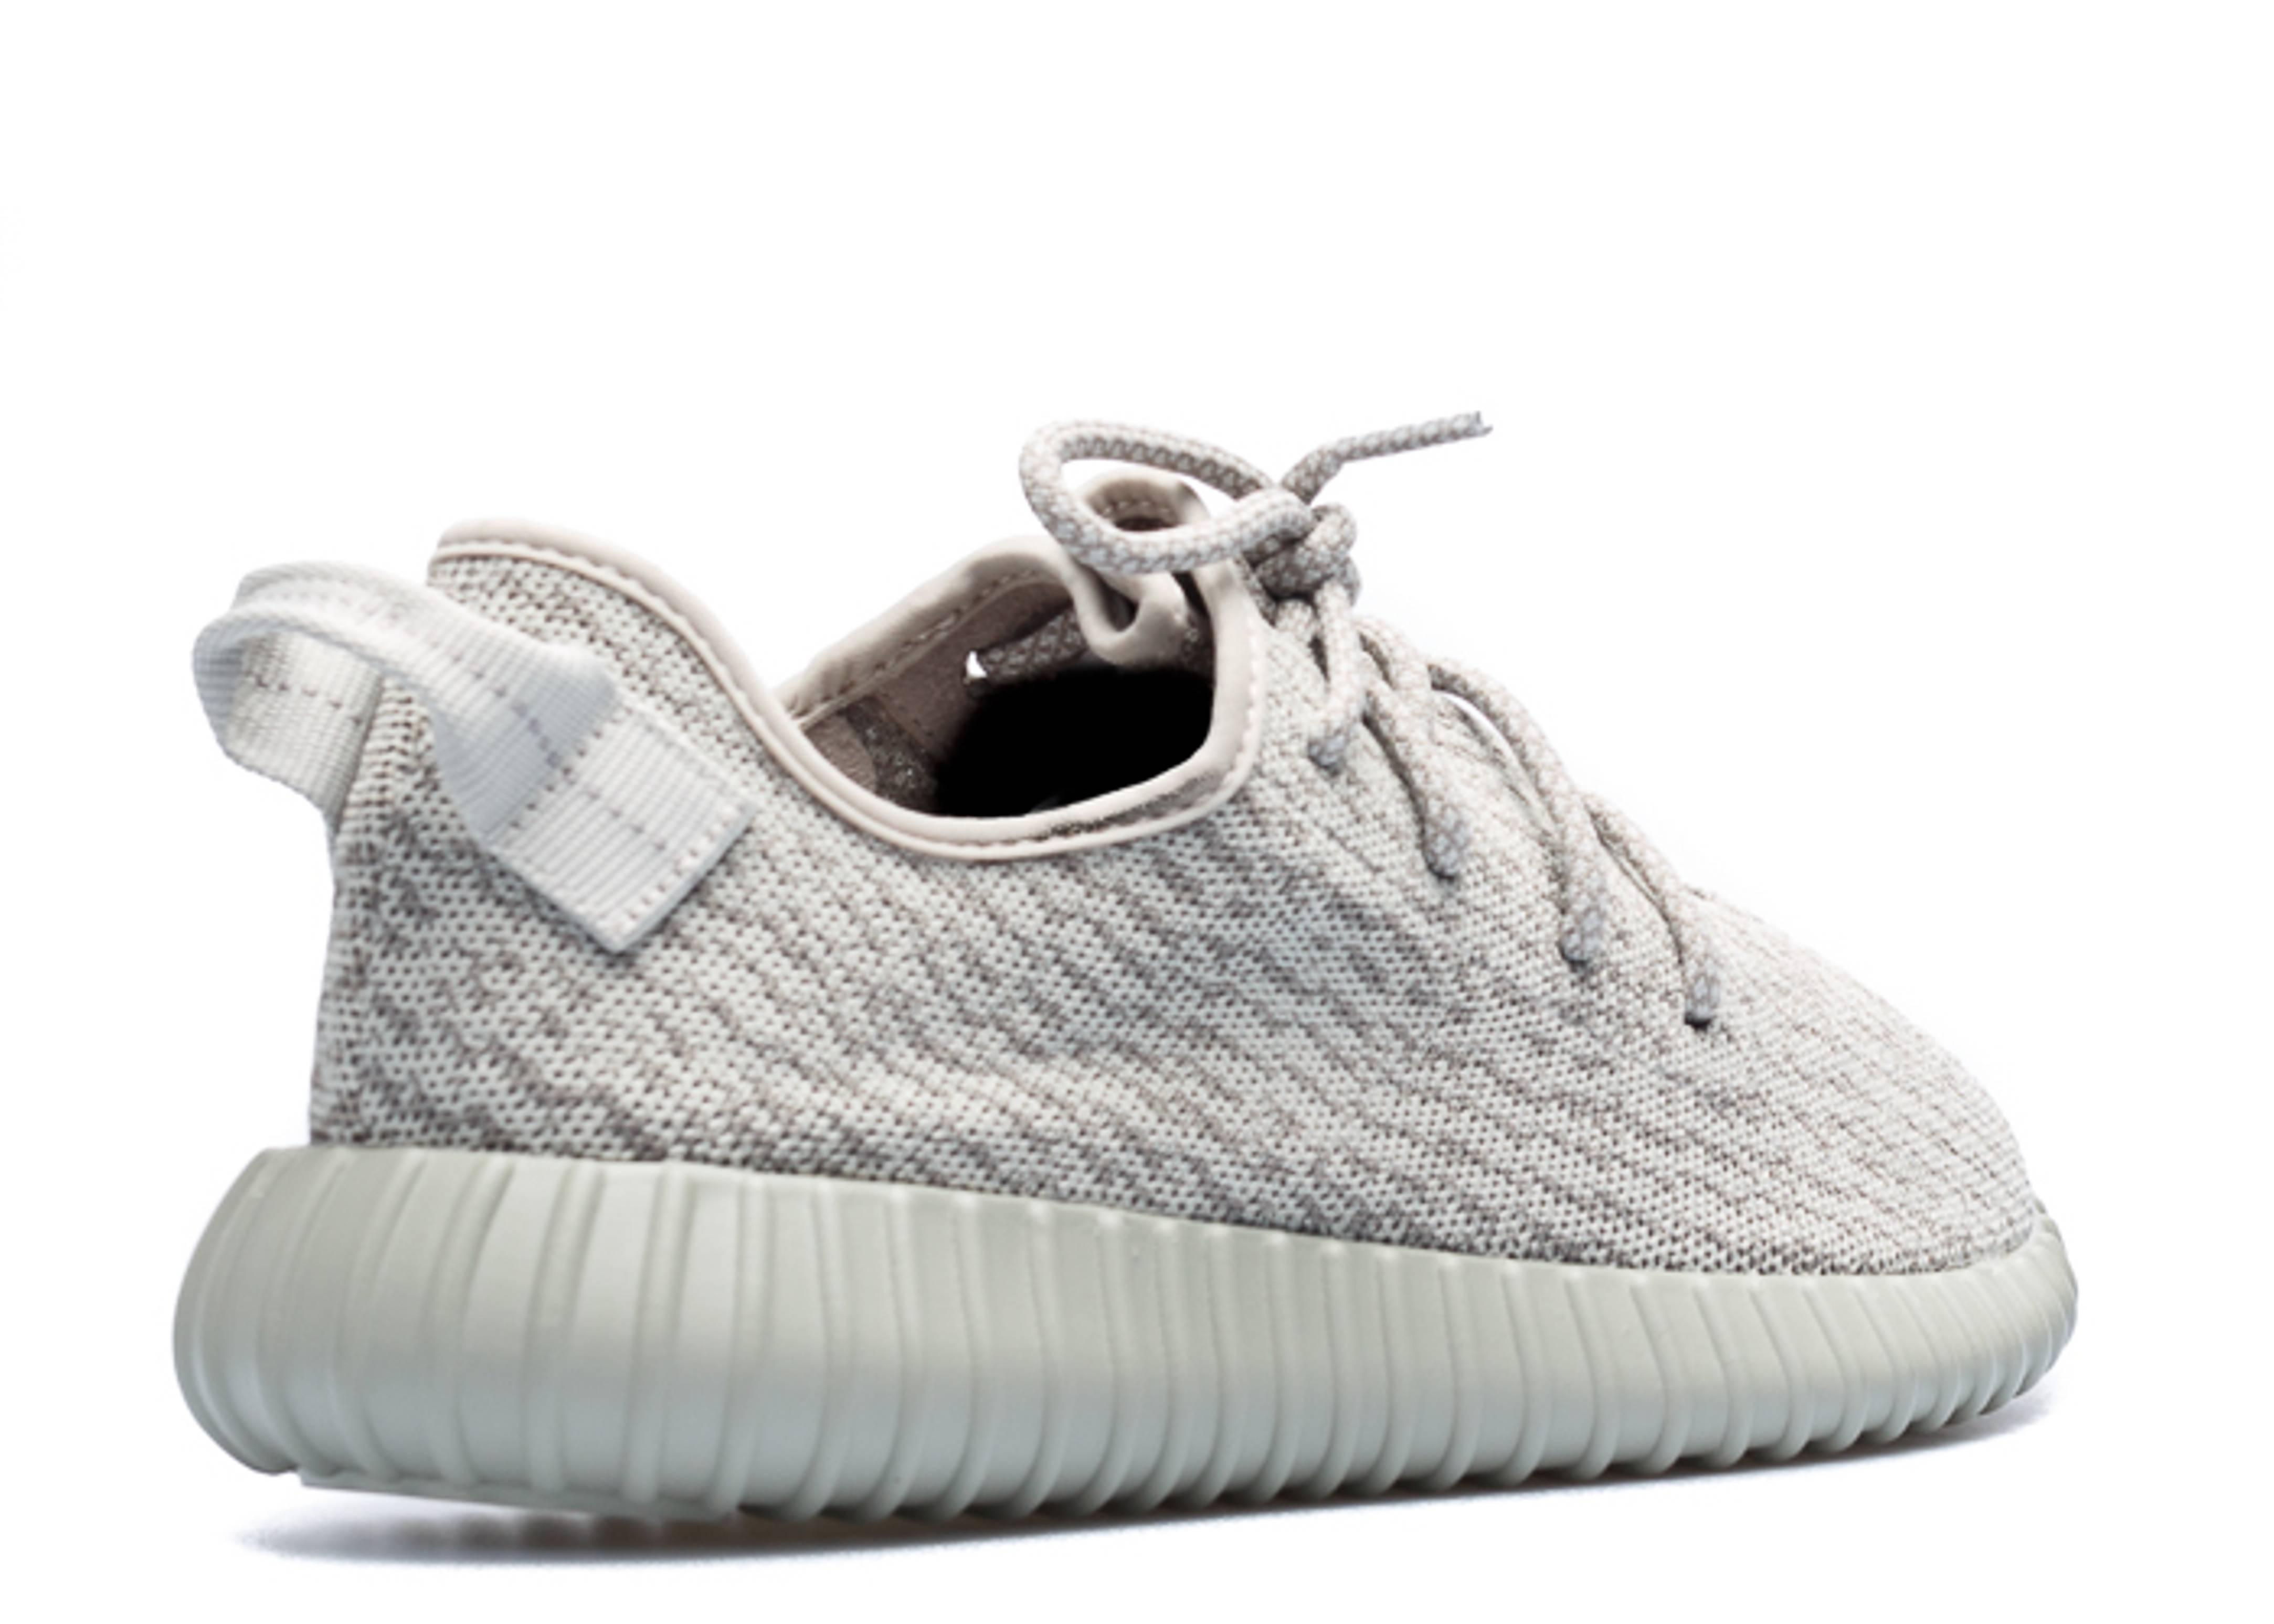 Adidas Yeezy 350 Boost Moonrock